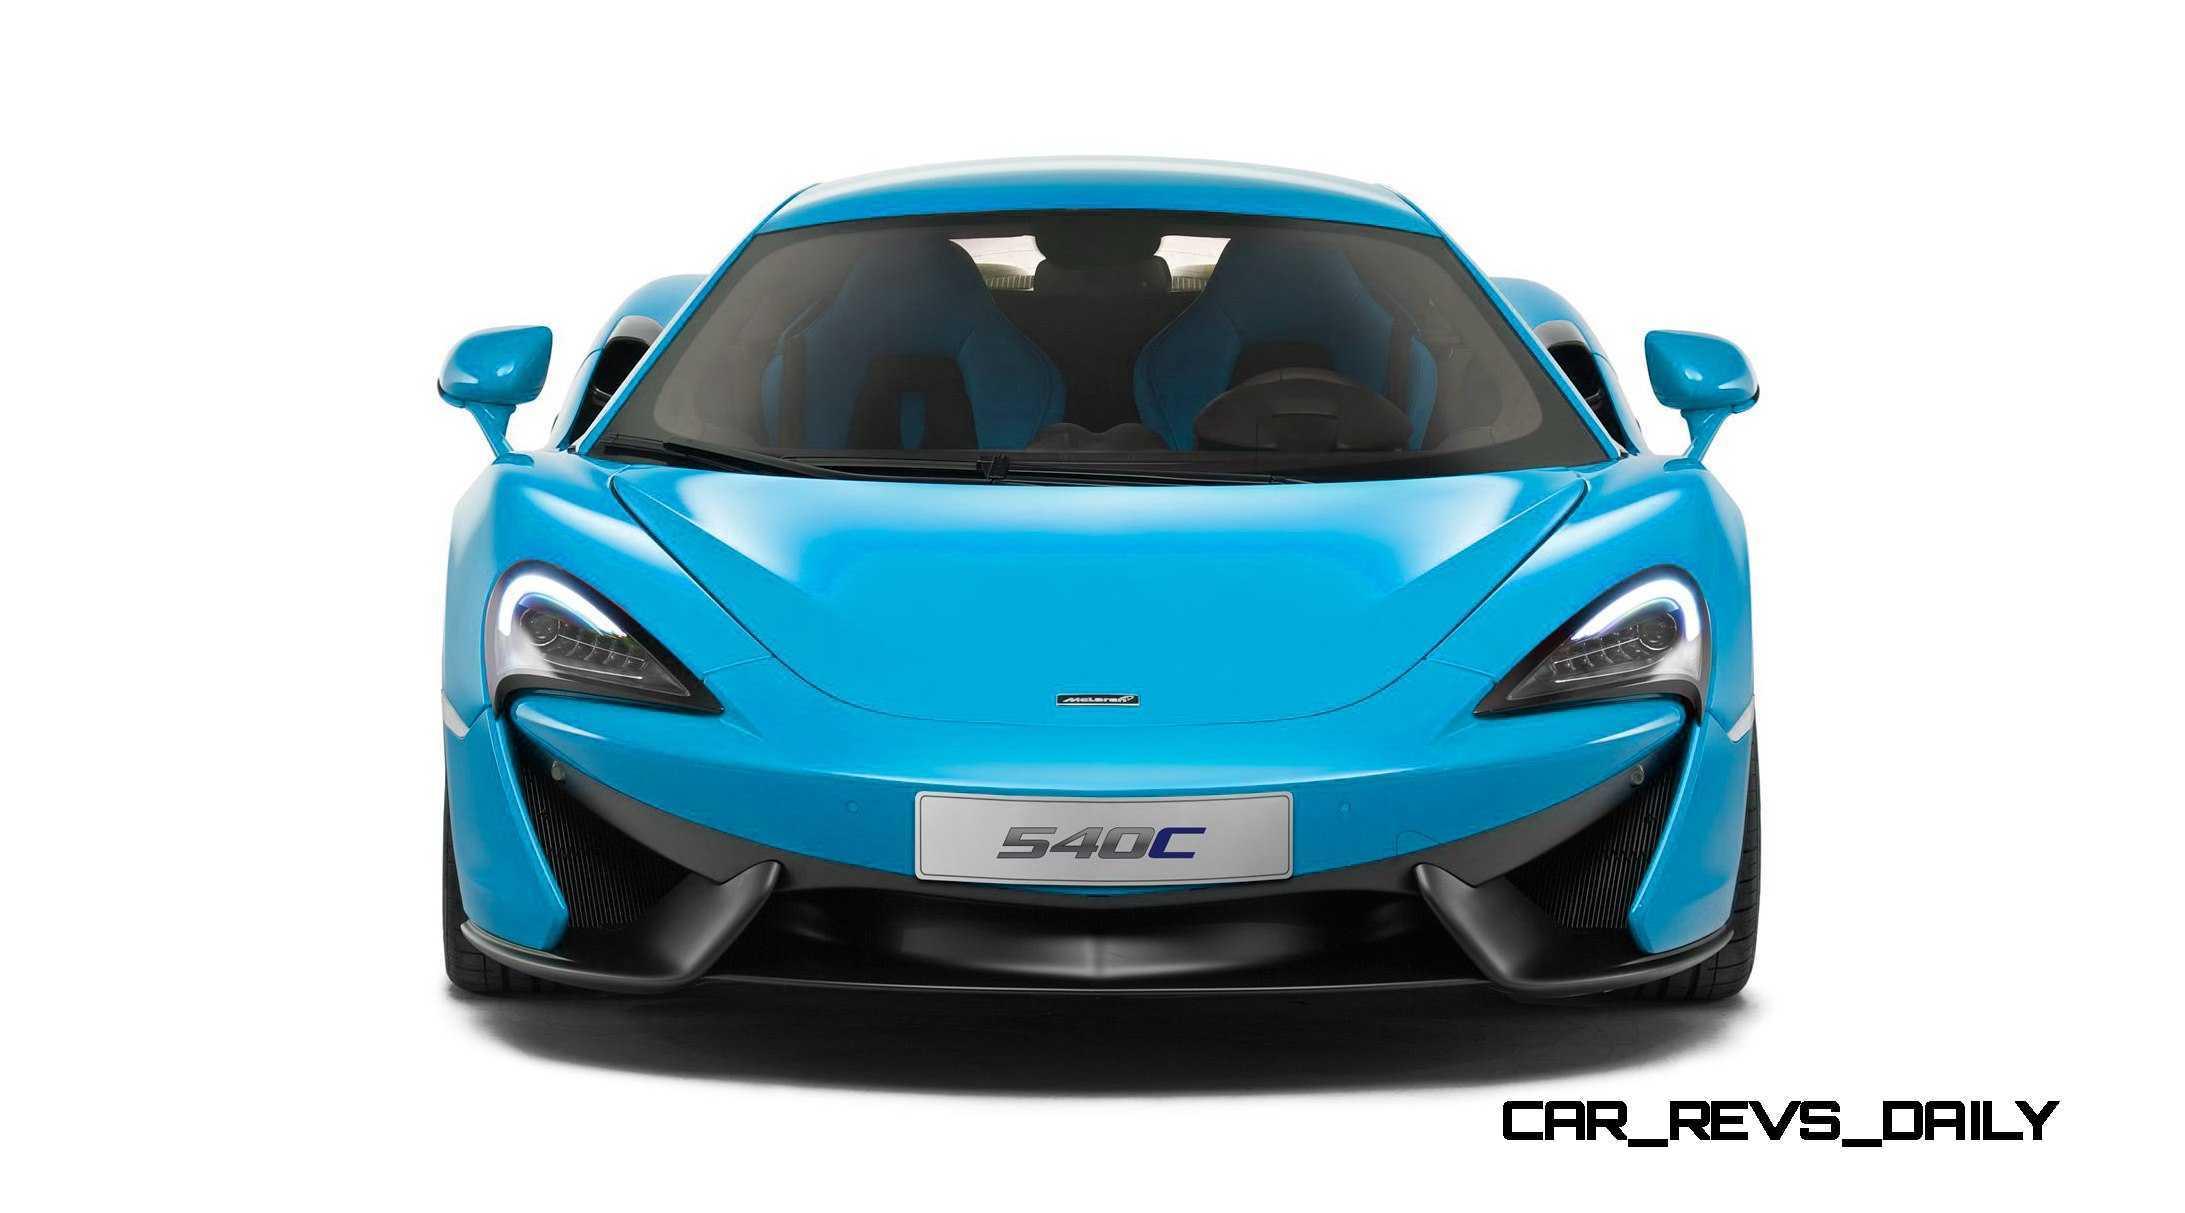 http://www.car-revs-daily.com/wp-content/uploads/2015/04/McLaren_540C_2317dg.jpg